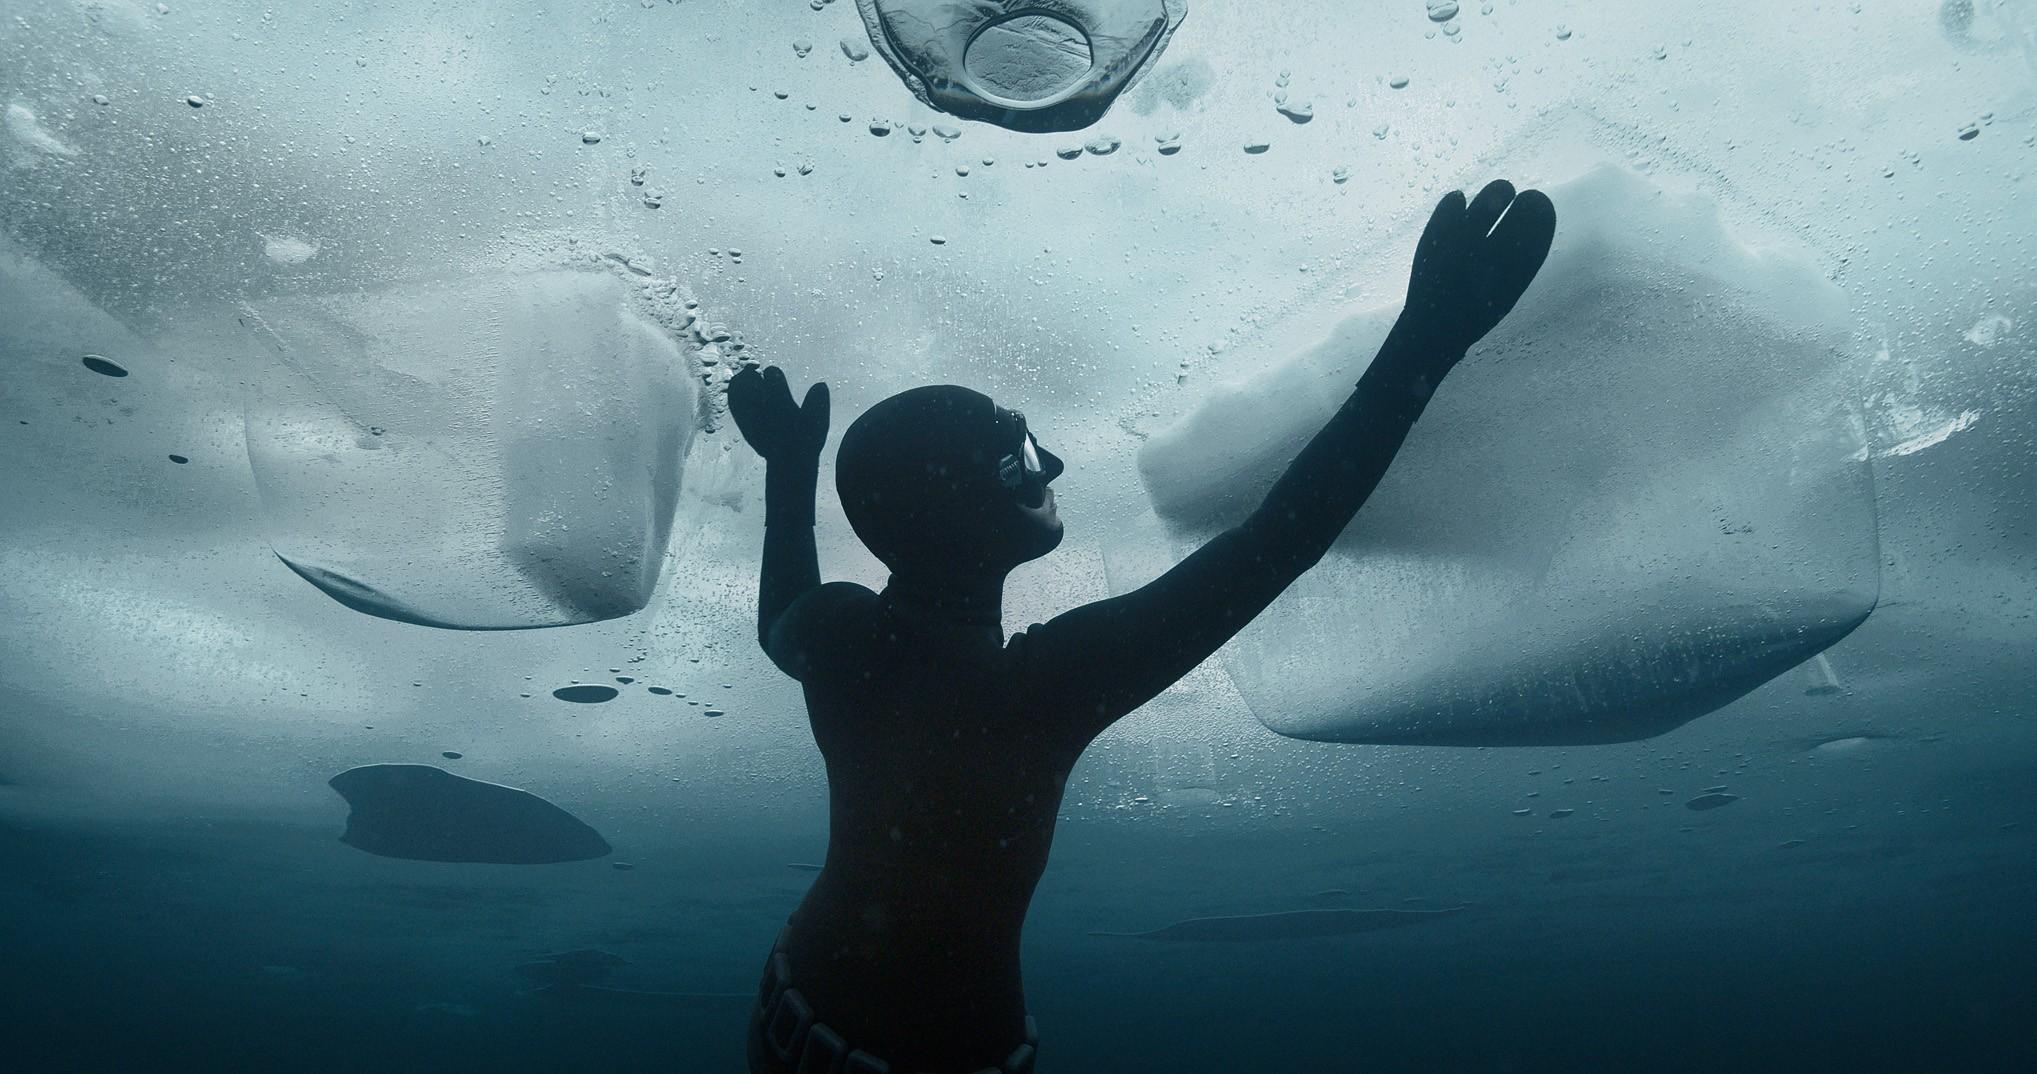 johanna-rolik-ob-ekstremalnom-zimnem-dajvinge-2